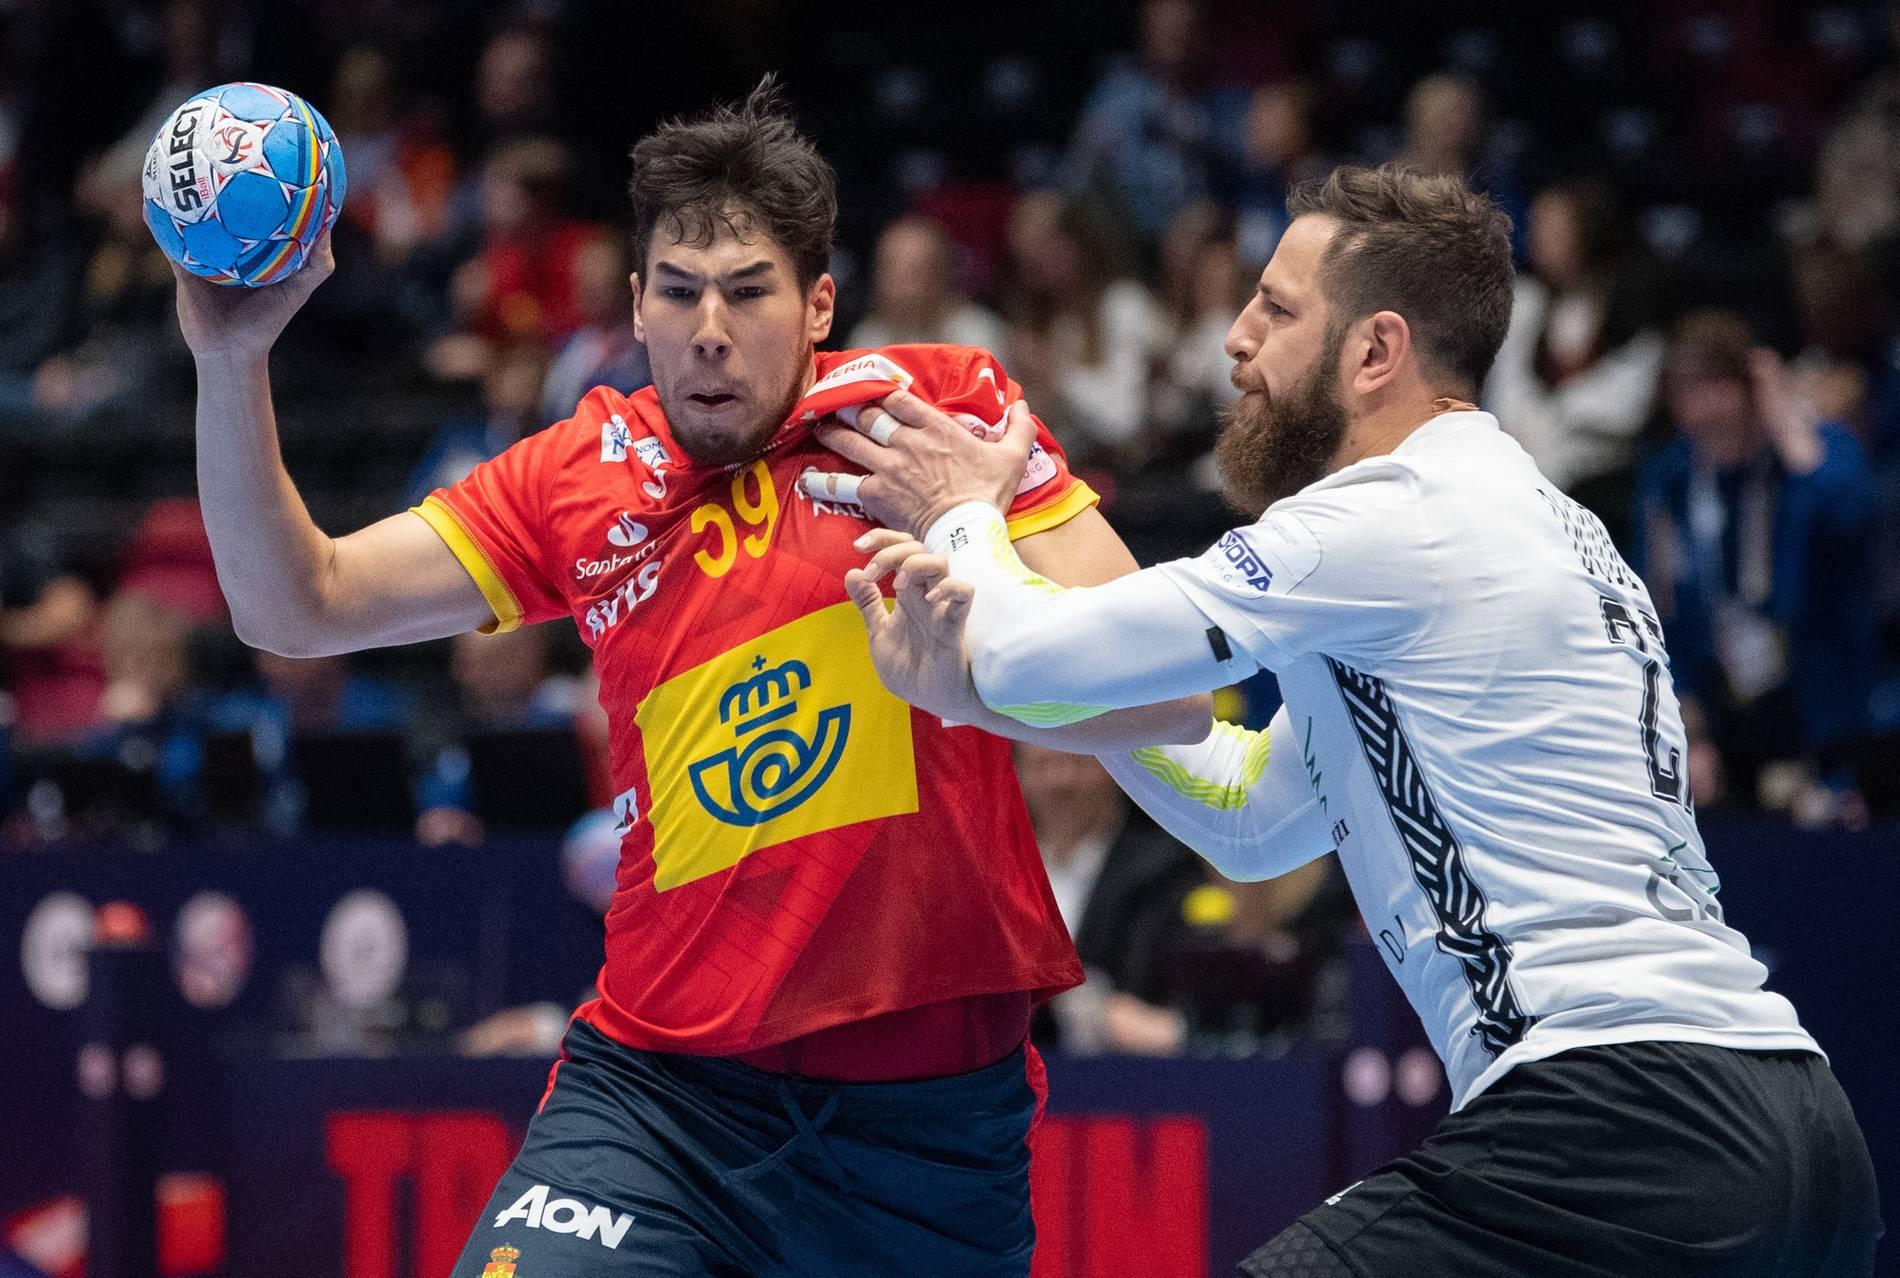 Handball Em 2020 Titelverteidiger Spanien Schlagt Lettland